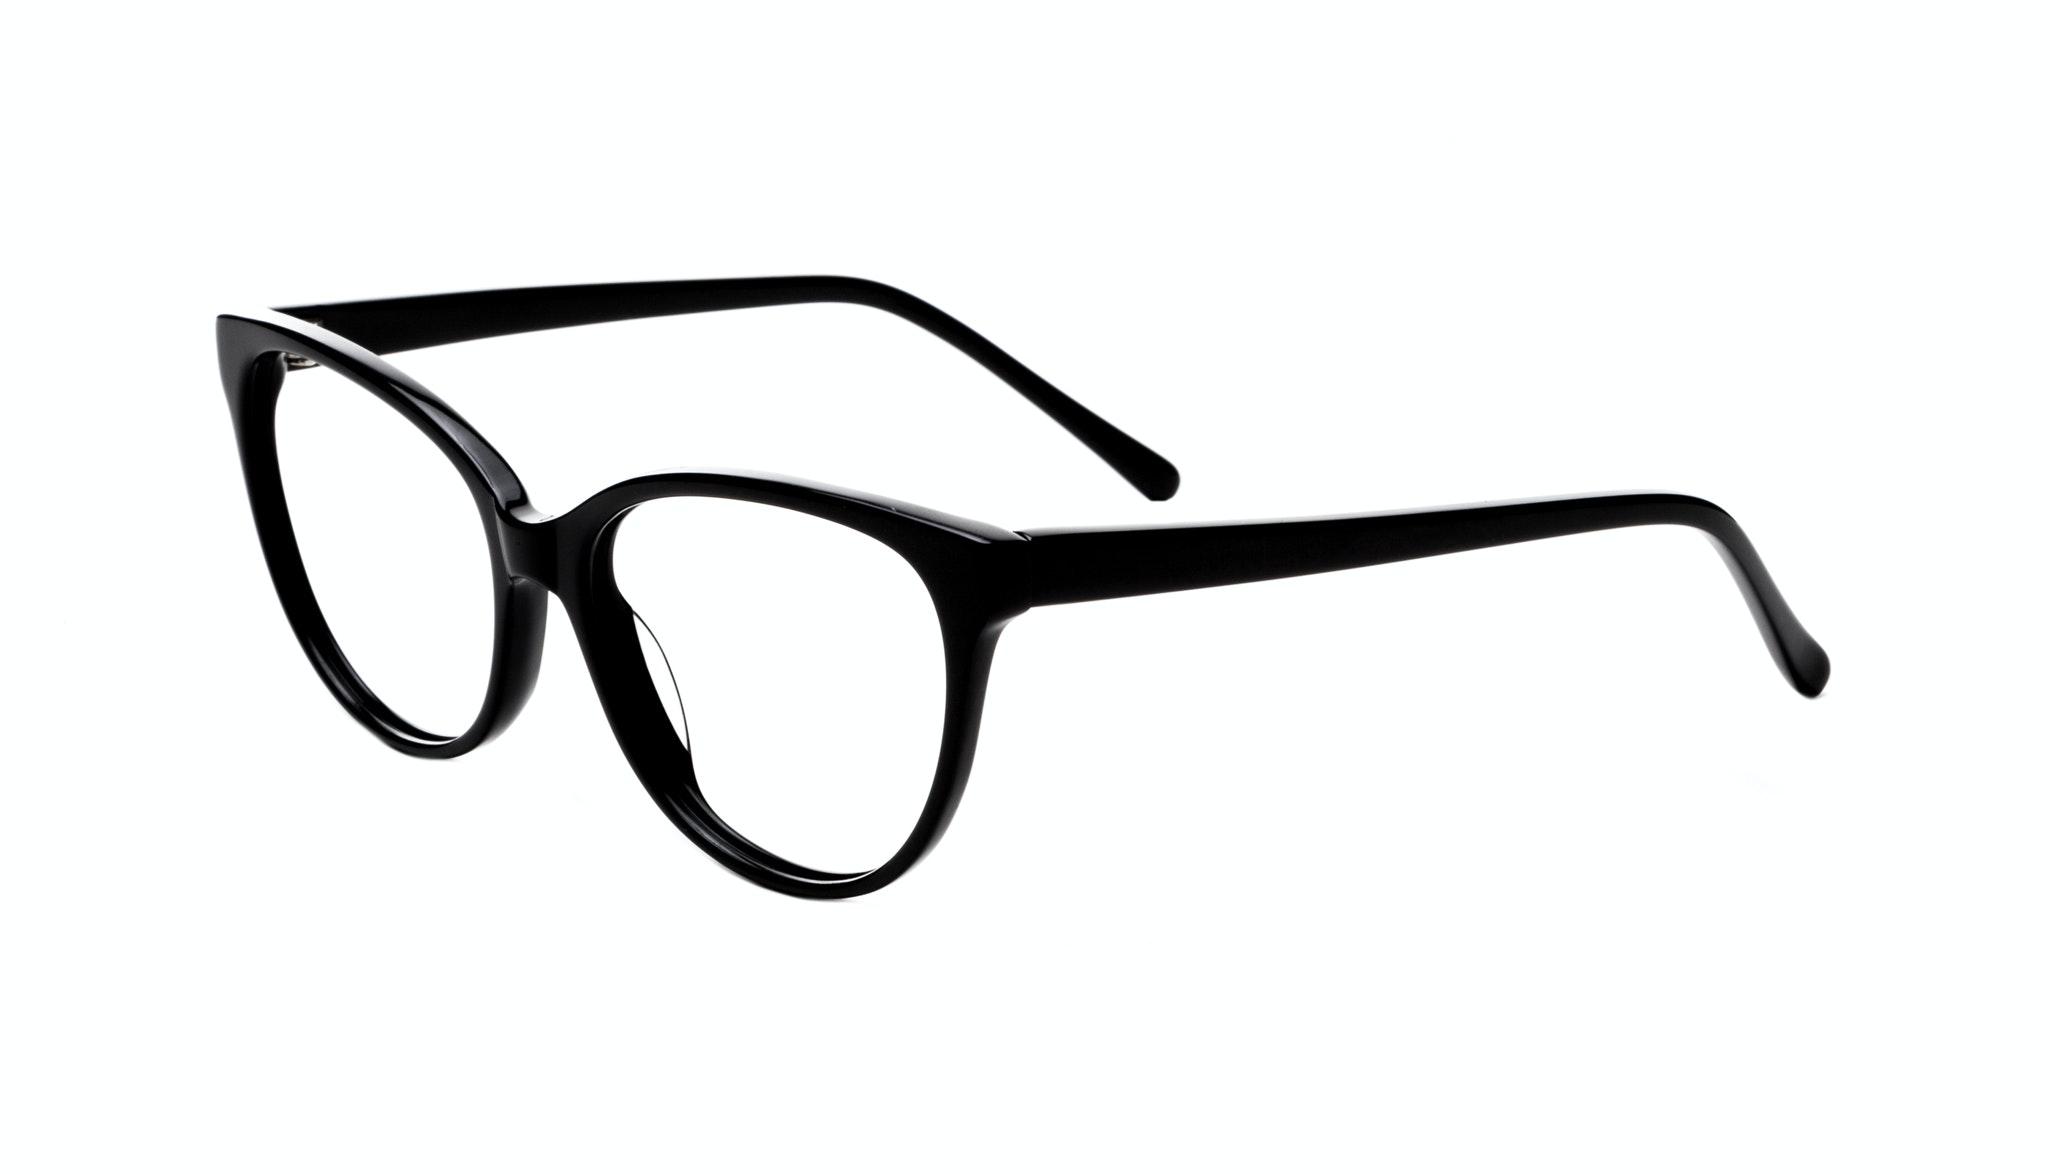 Affordable Fashion Glasses Cat Eye Round Eyeglasses Women Imagine Onyx Tilt